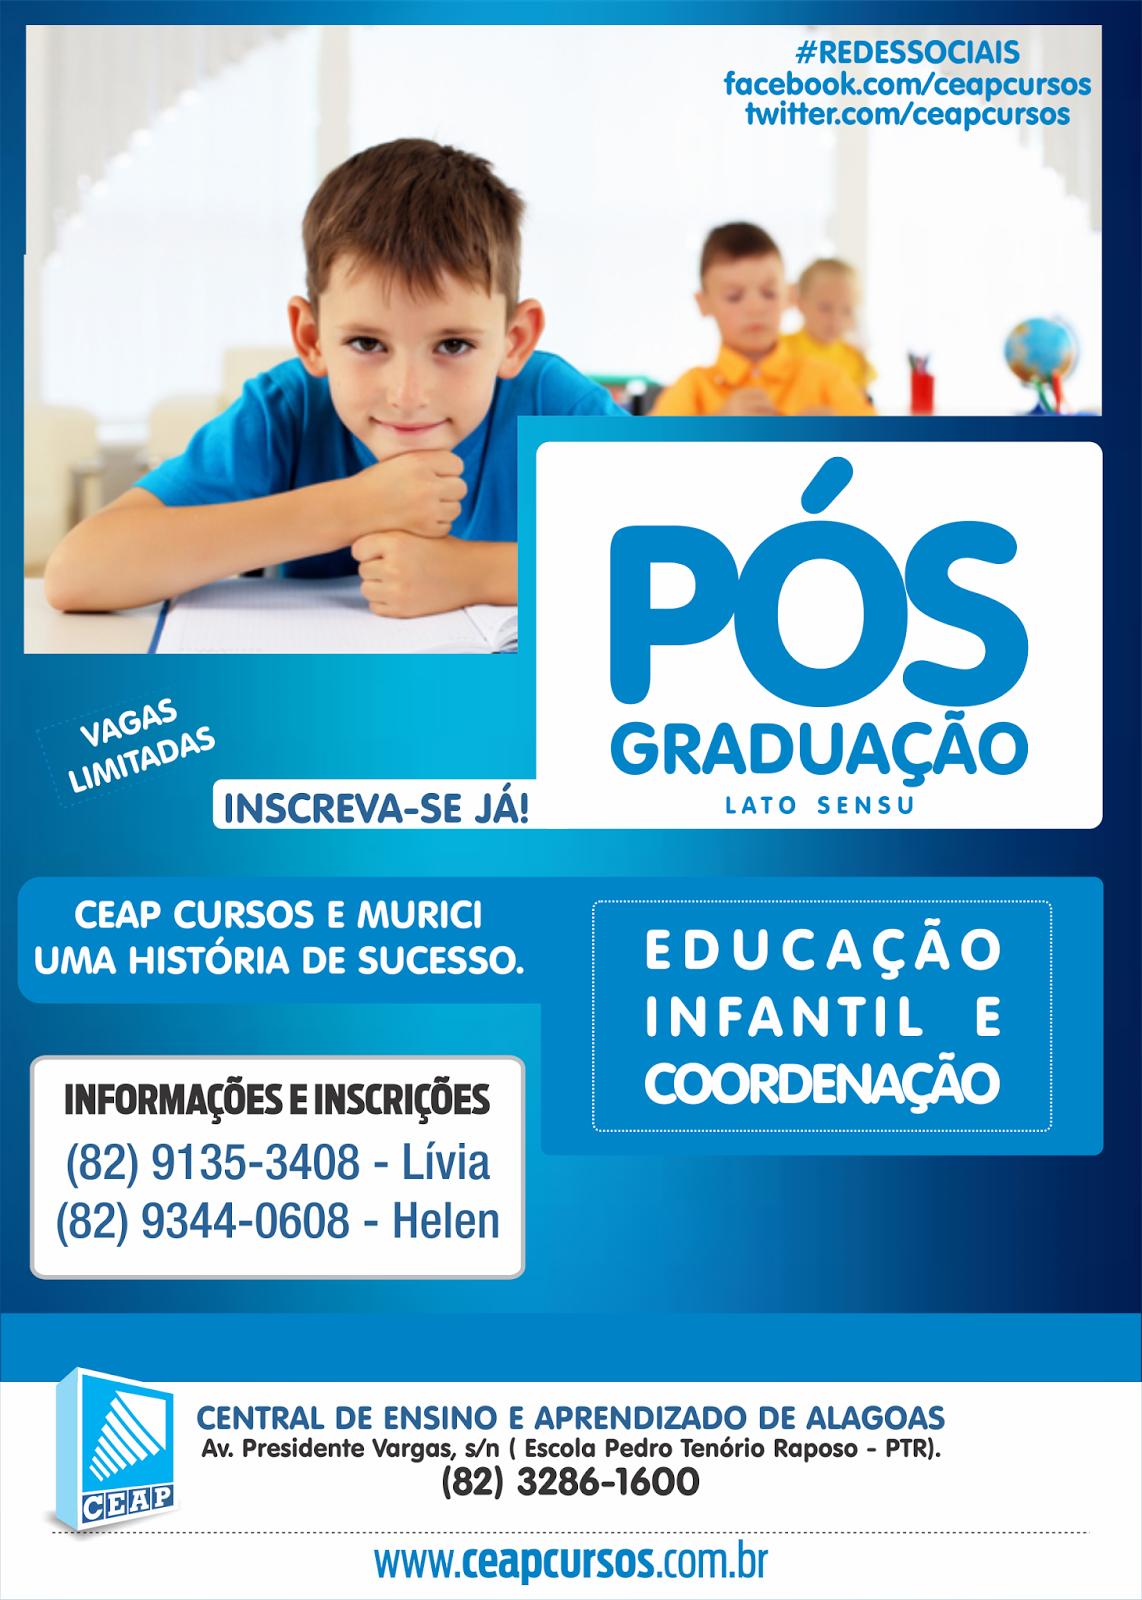 www.facebook.com/ceapcursos